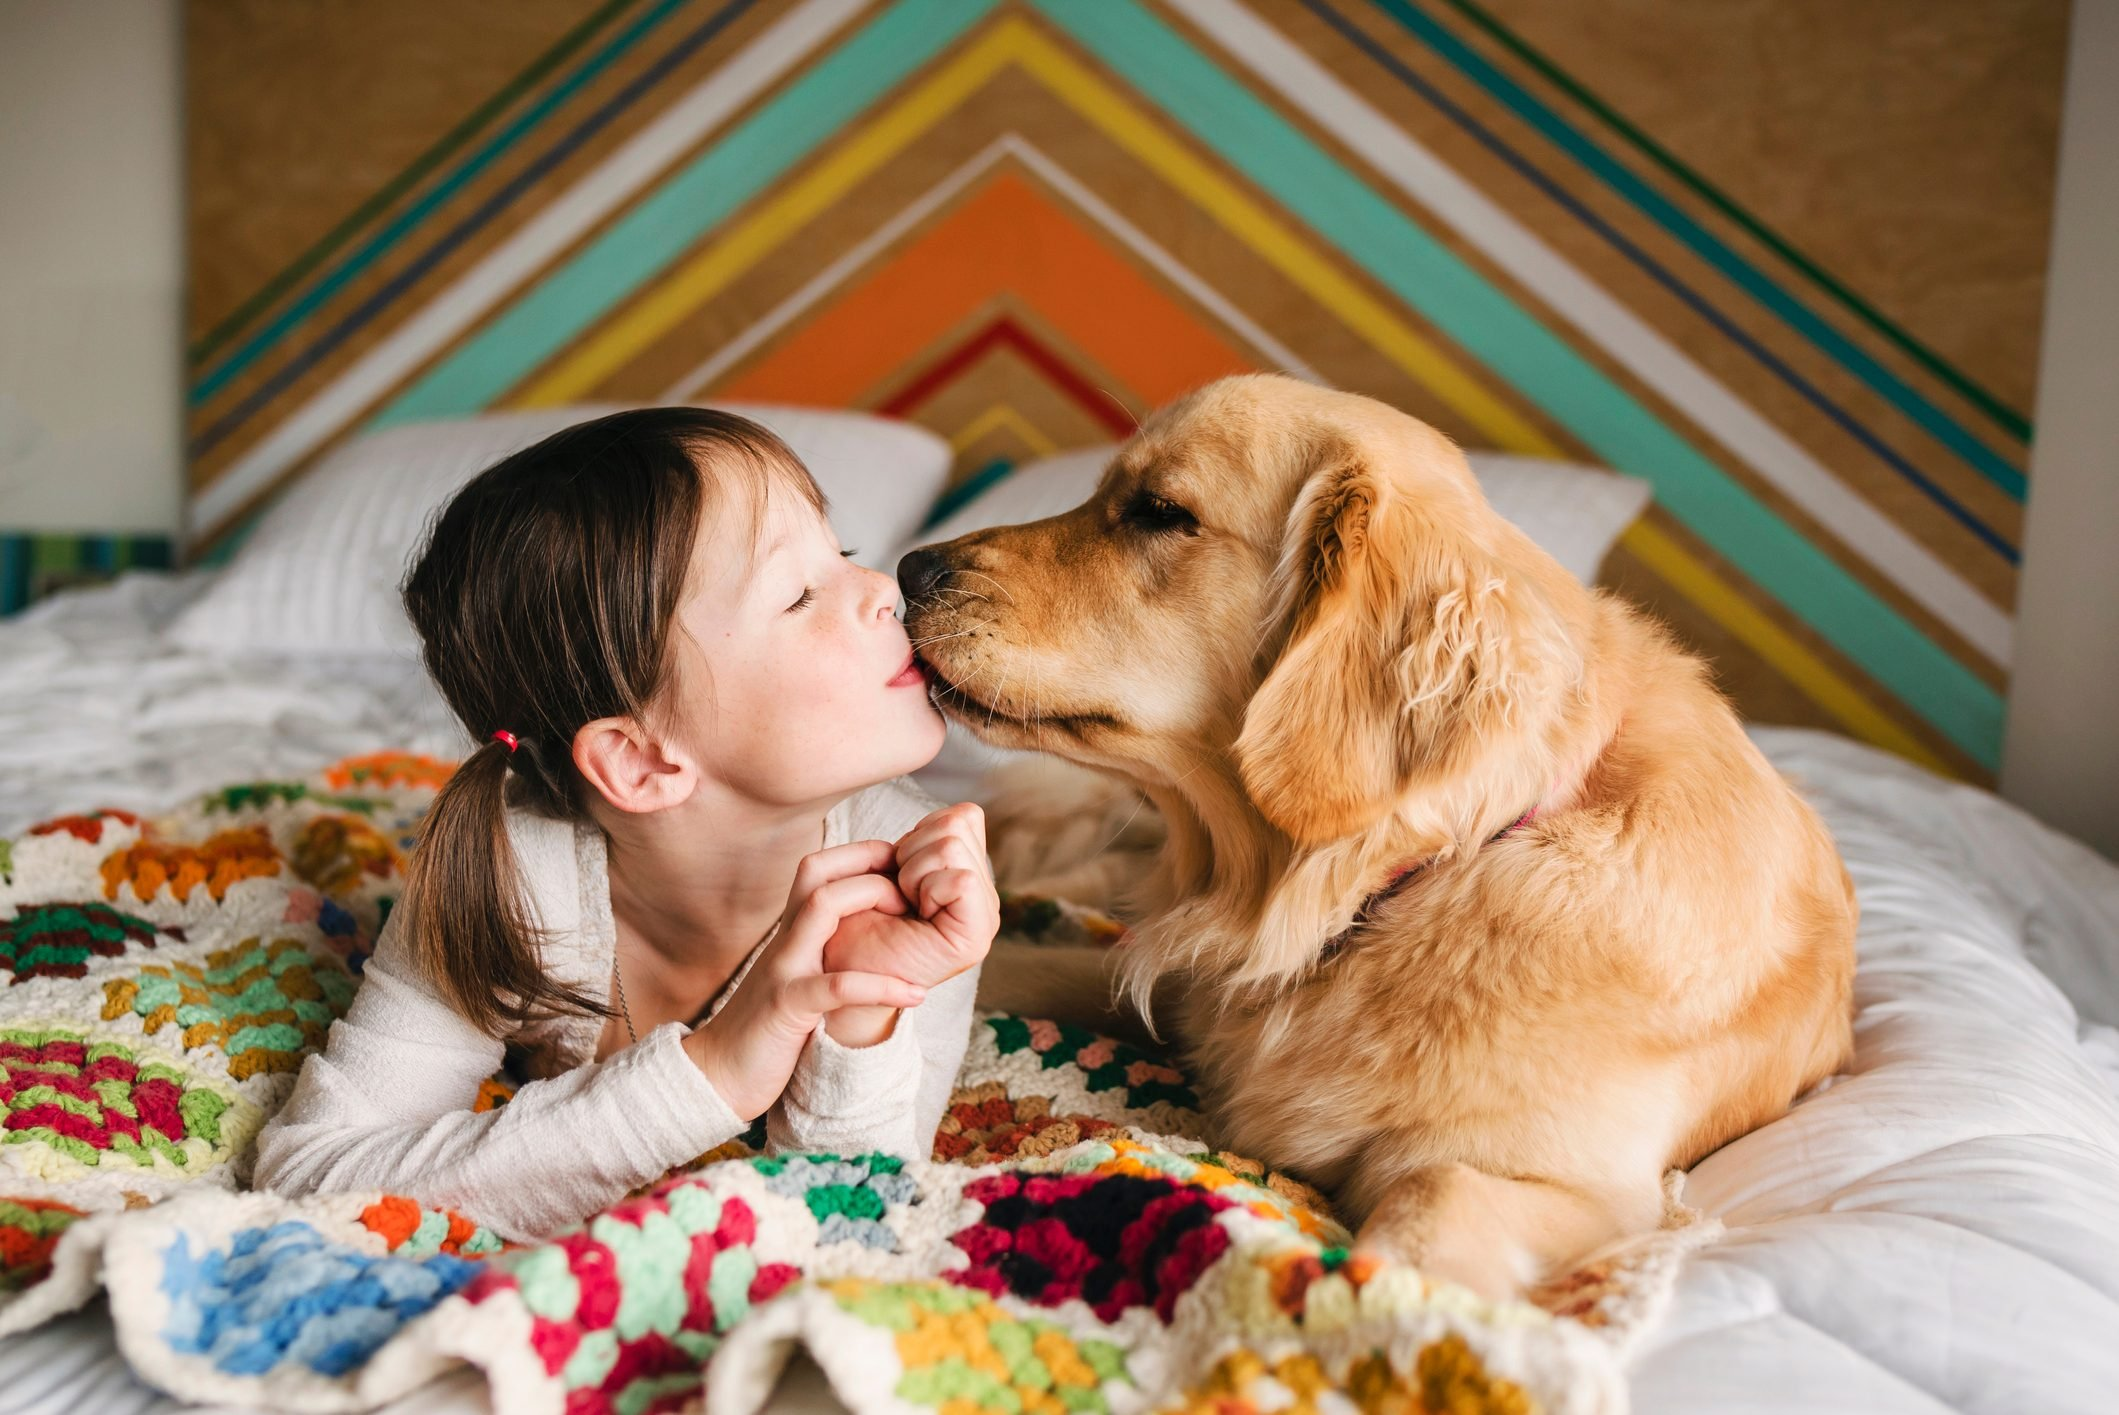 Girl lying on a bed kissing her golden retriever dog